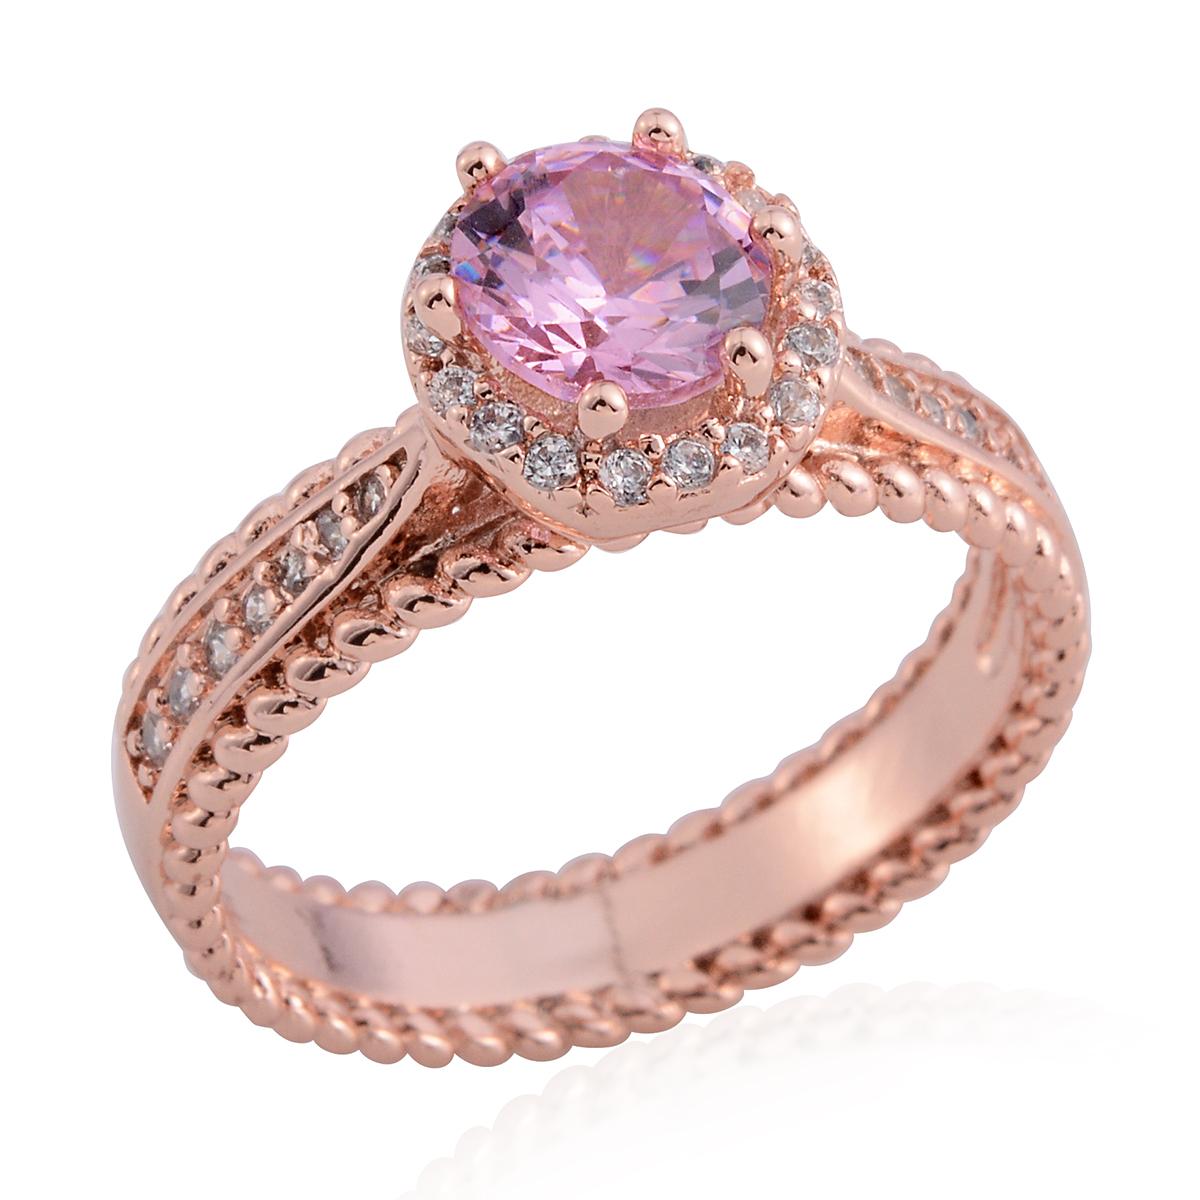 Simulated Pink Diamond, Simulated Diamond ION Plated RG Stainless ...